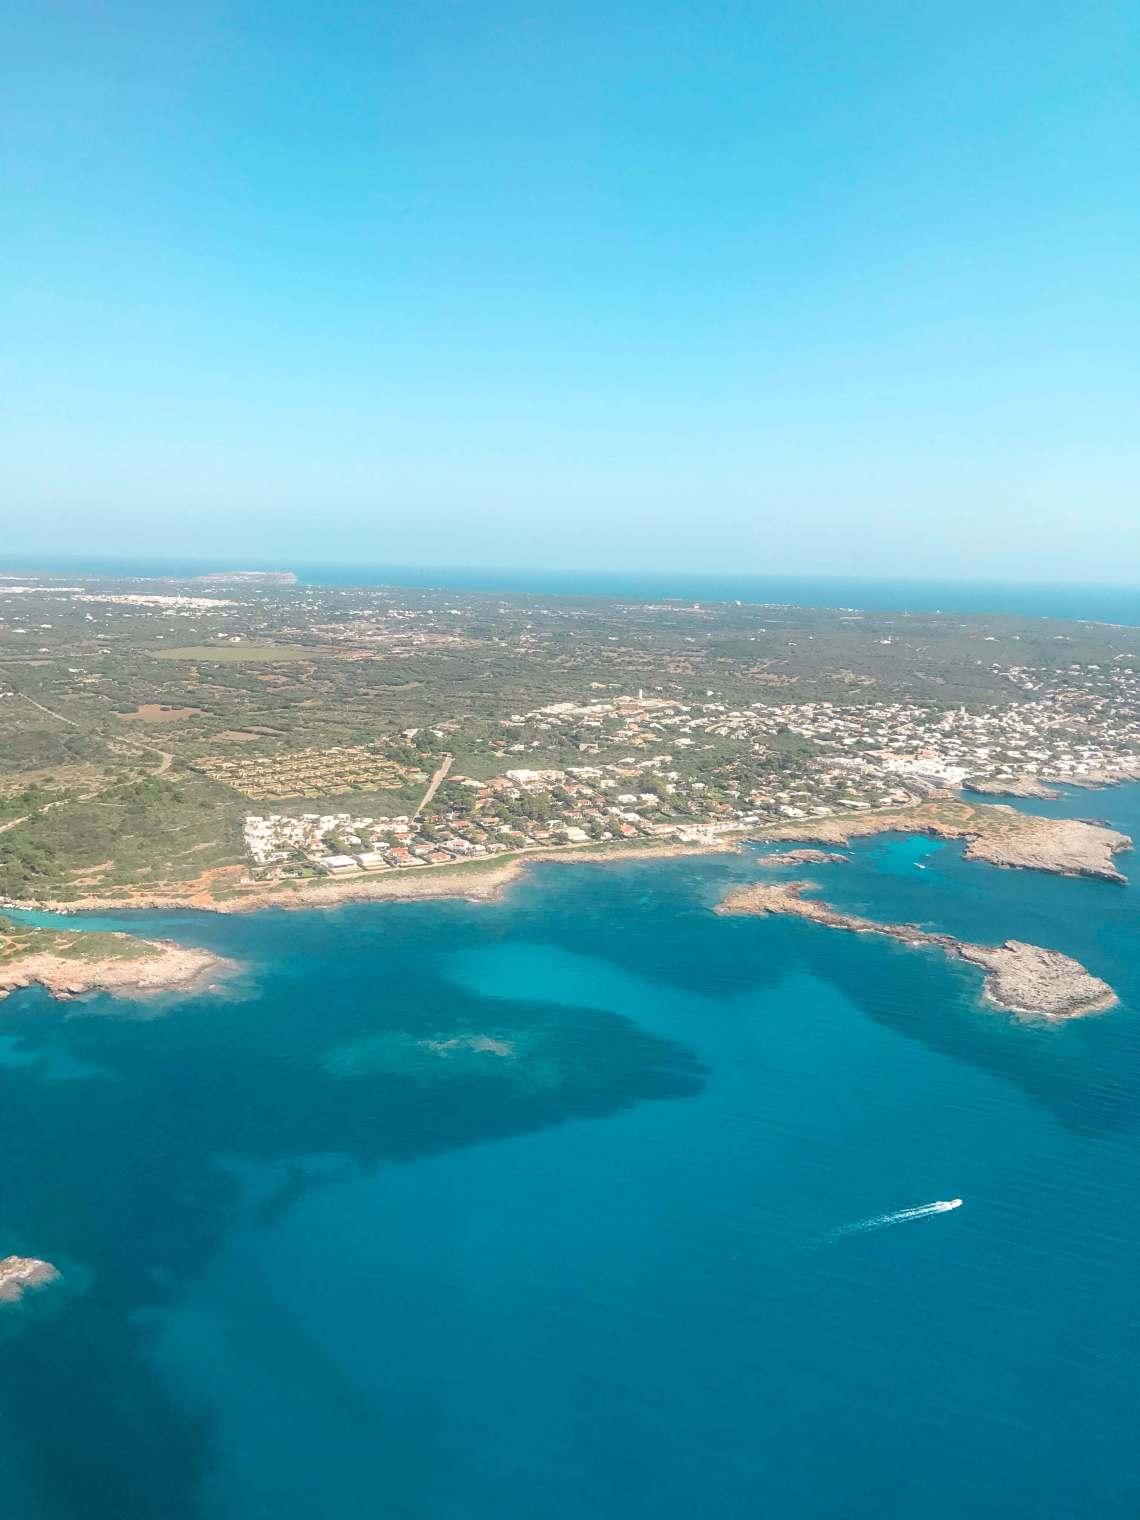 Perchè andare a Minorca